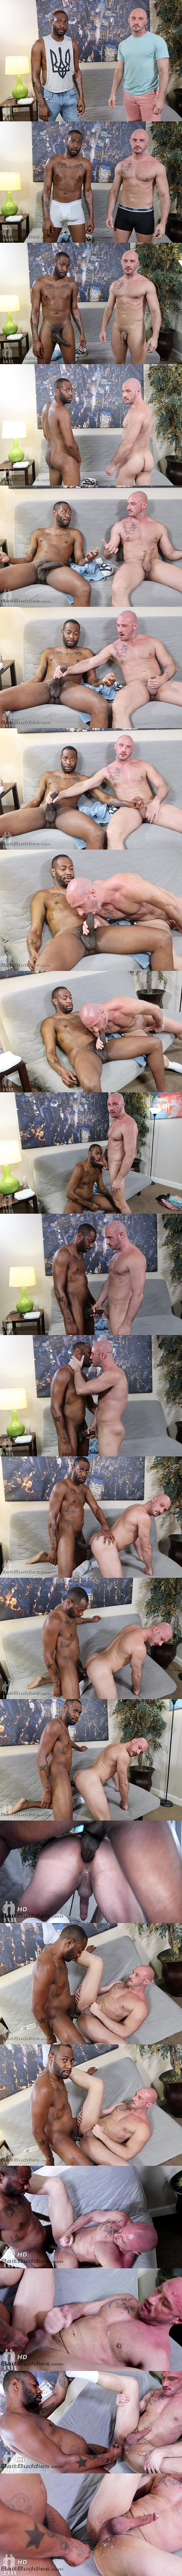 Baitbuddies - big-dicked black porn star August Alexander barebacks bald daddy bottom Greg Riley in an interracial encounter before he fucks the cum out of Greg 02